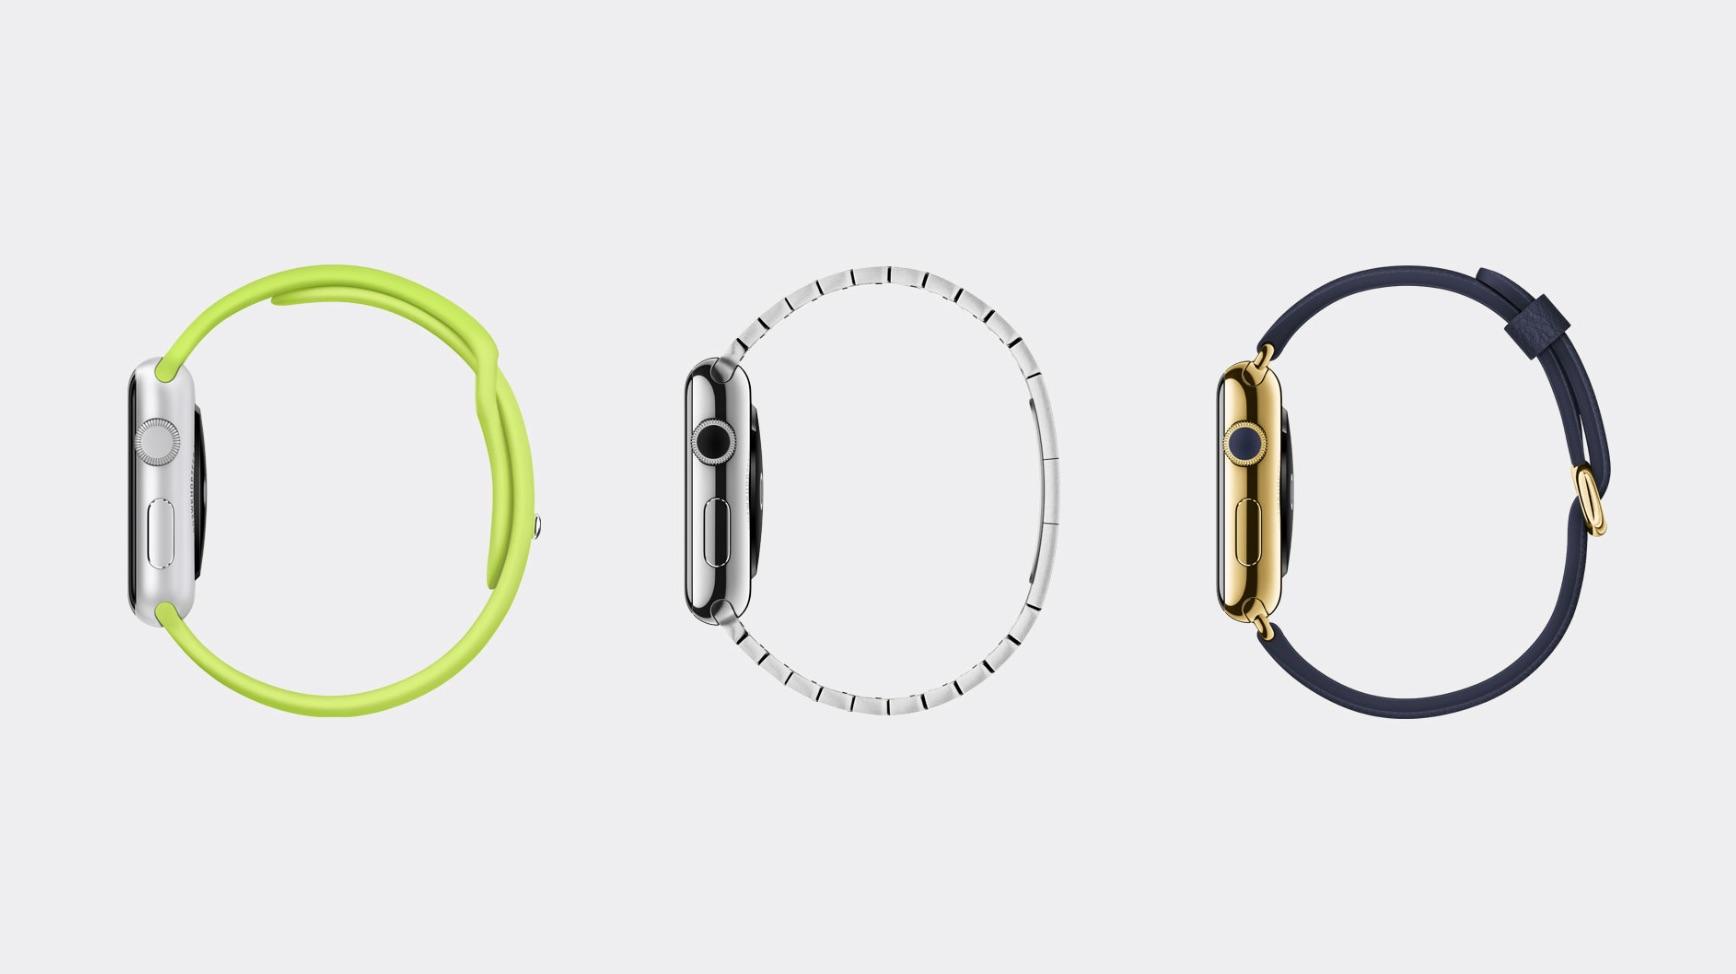 Apple WatchはIPX7等級の非防水に――アップルは「水に浸すことは推奨しない」と案内